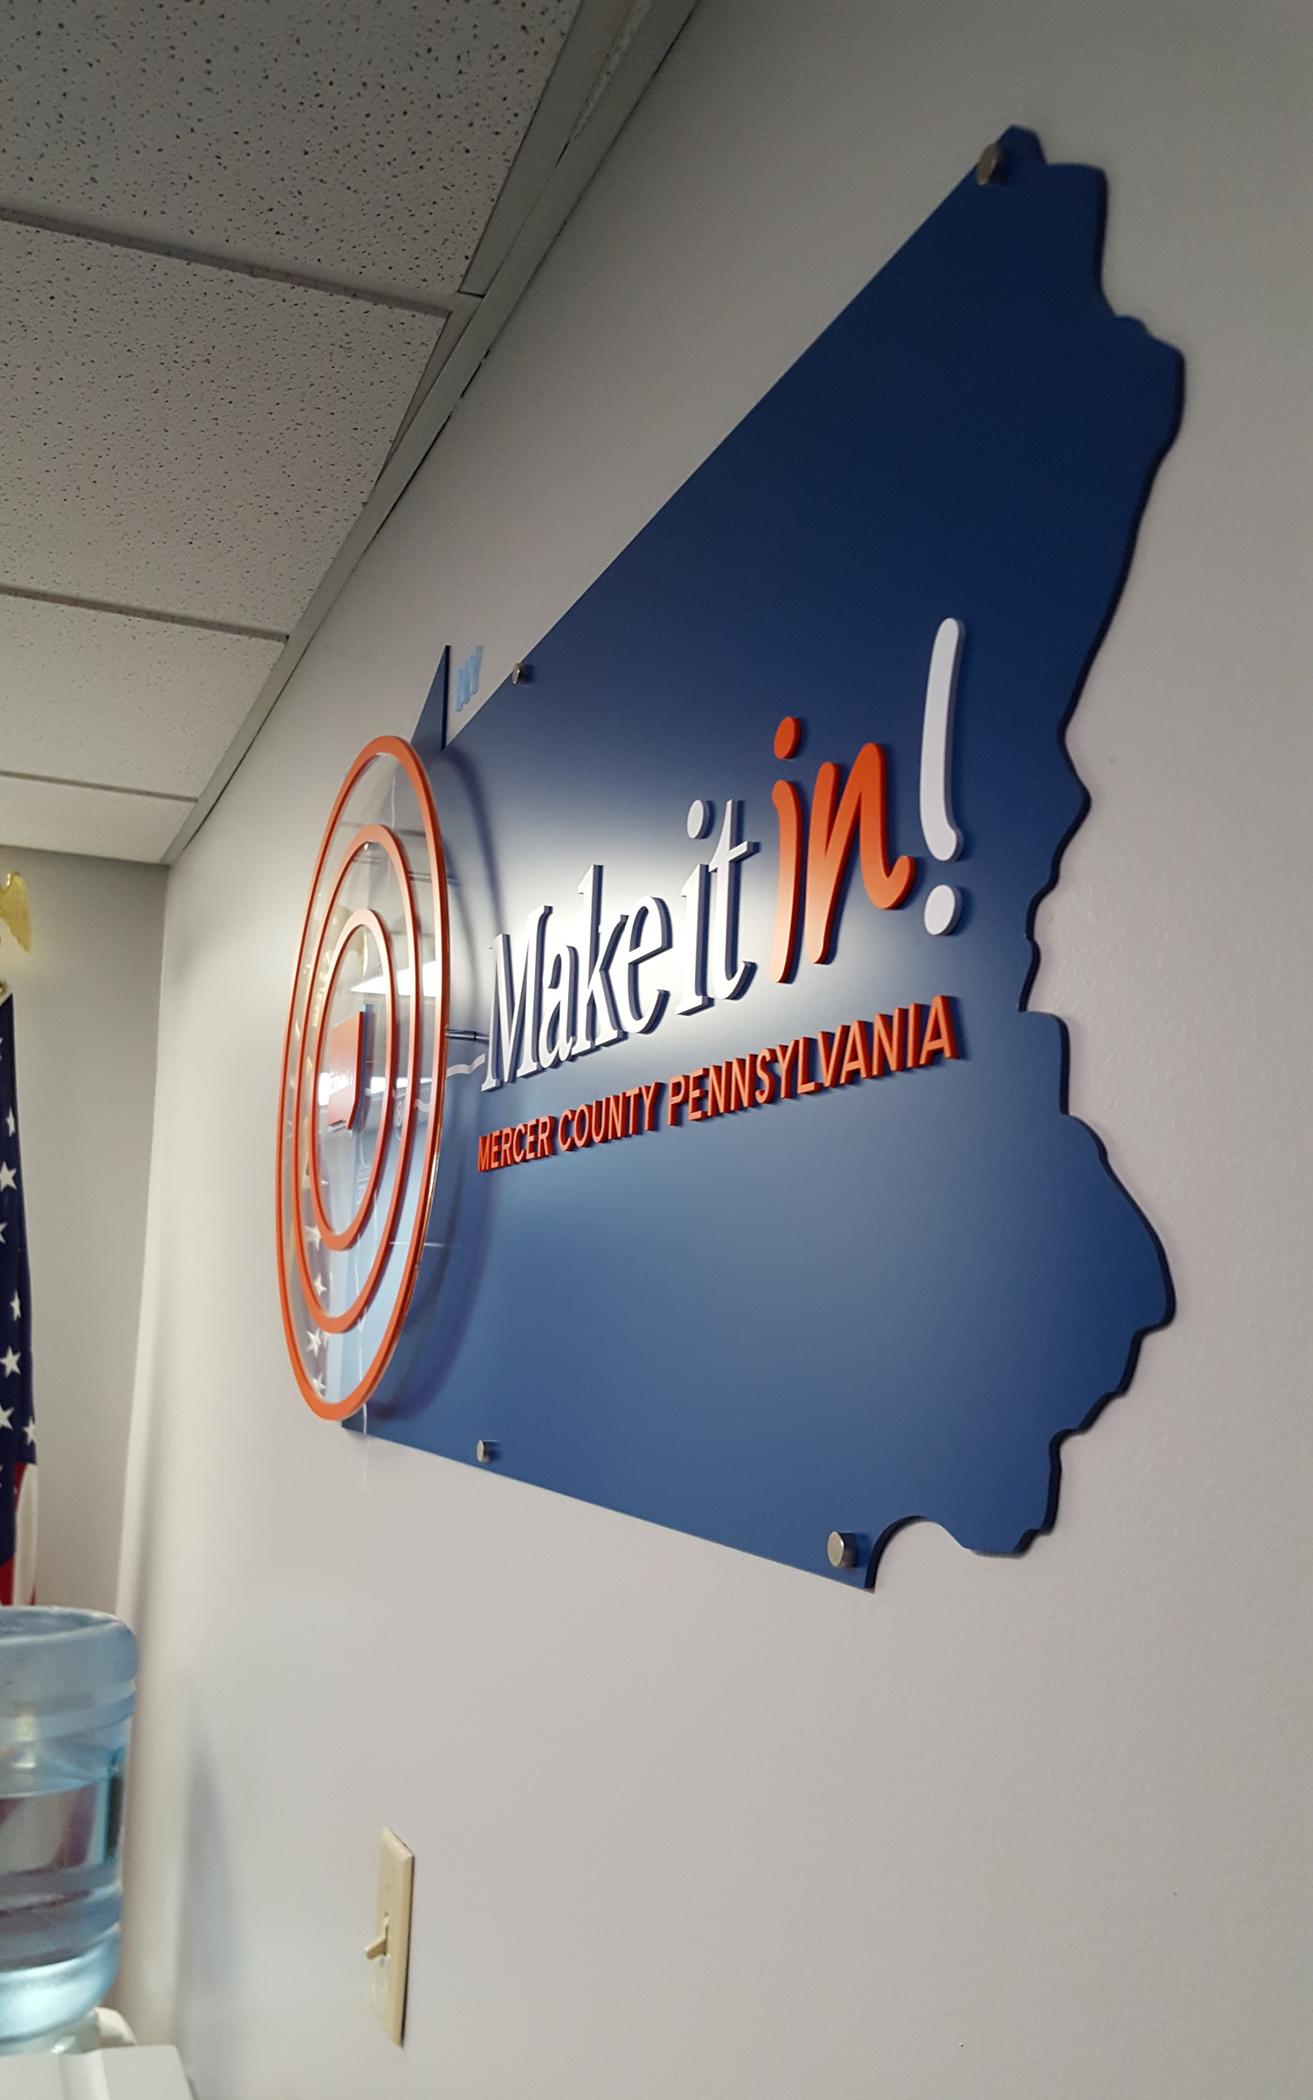 Client: Penn-Northwest Development Corporation